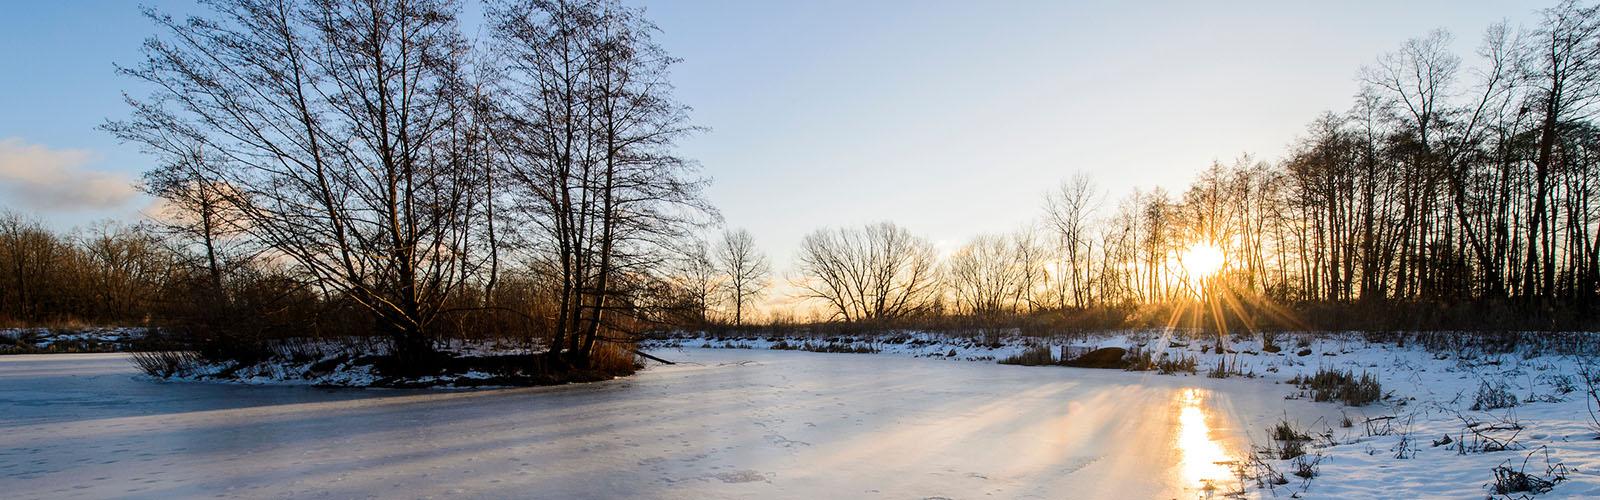 Winter Sunshine in the University of Wisconsin-Madison Arboretum